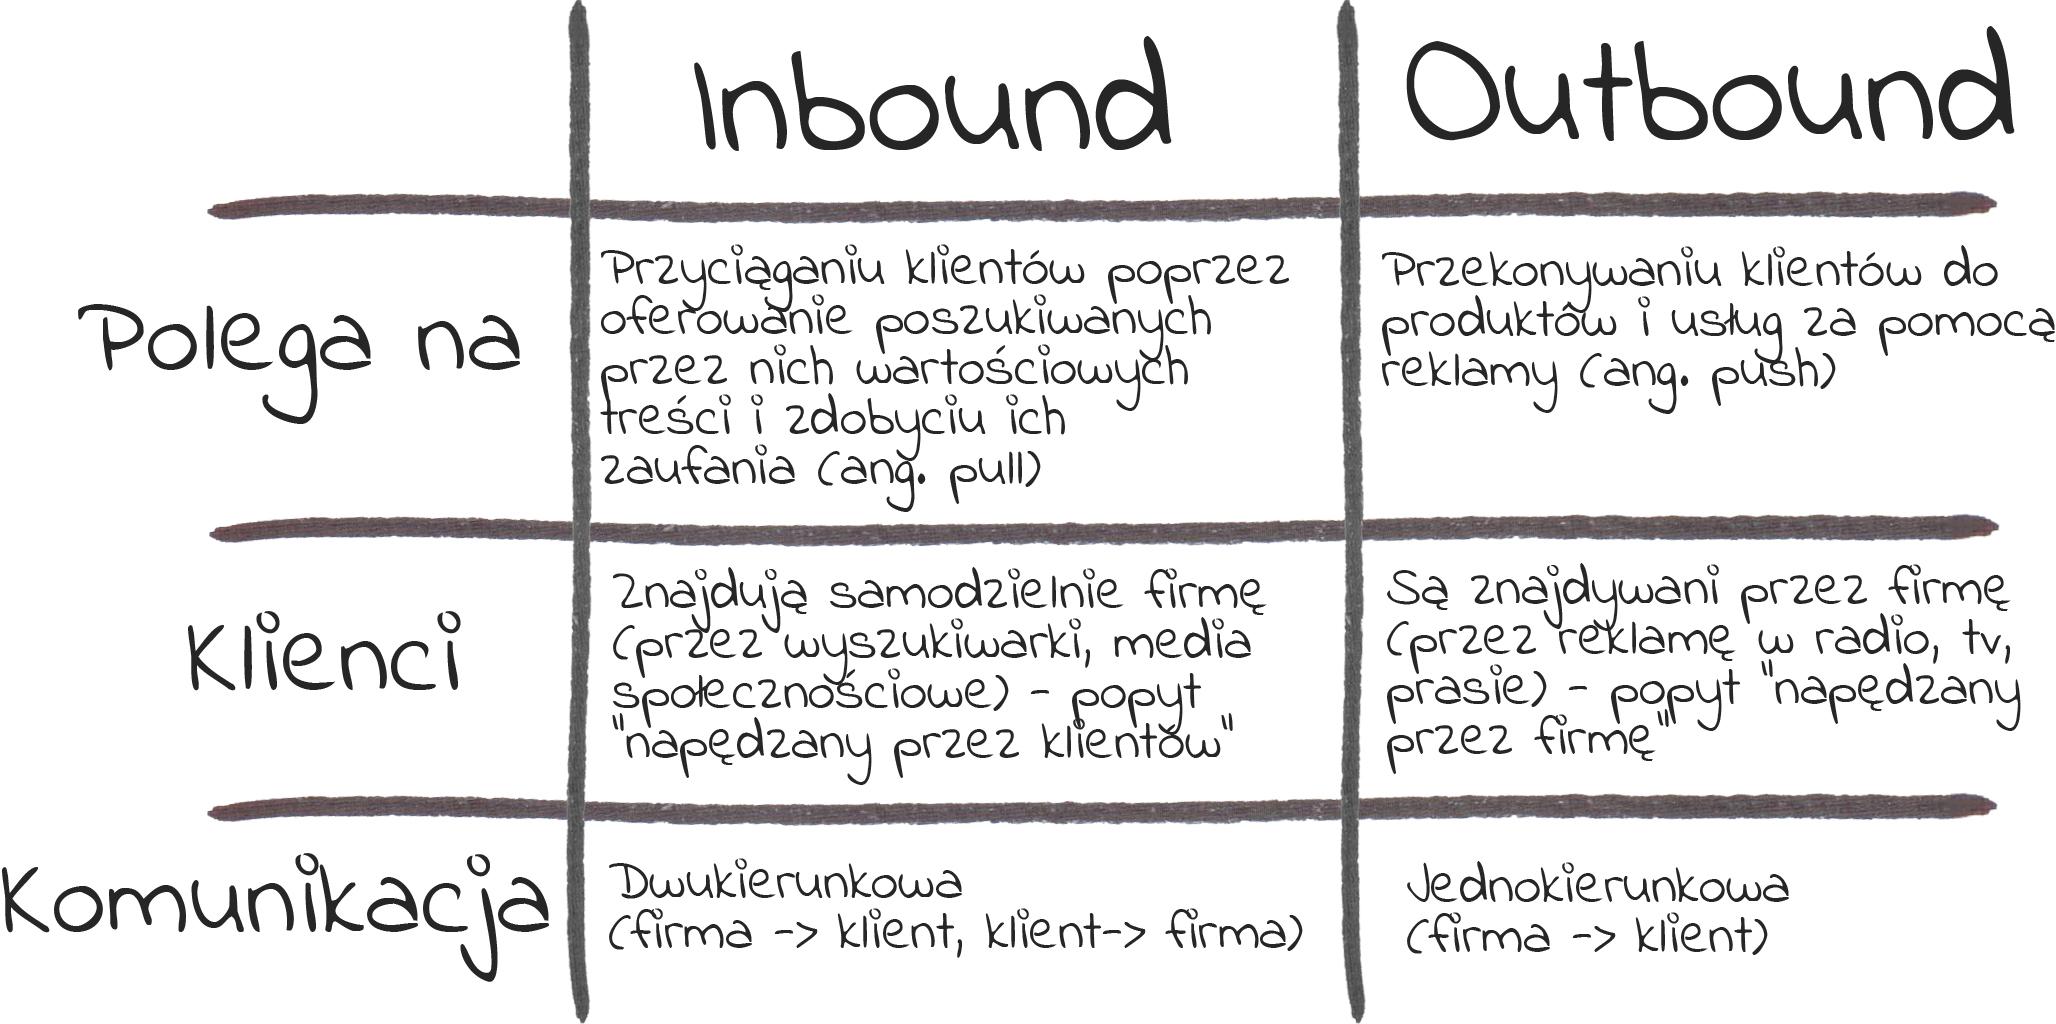 tabela Inbound Outbound